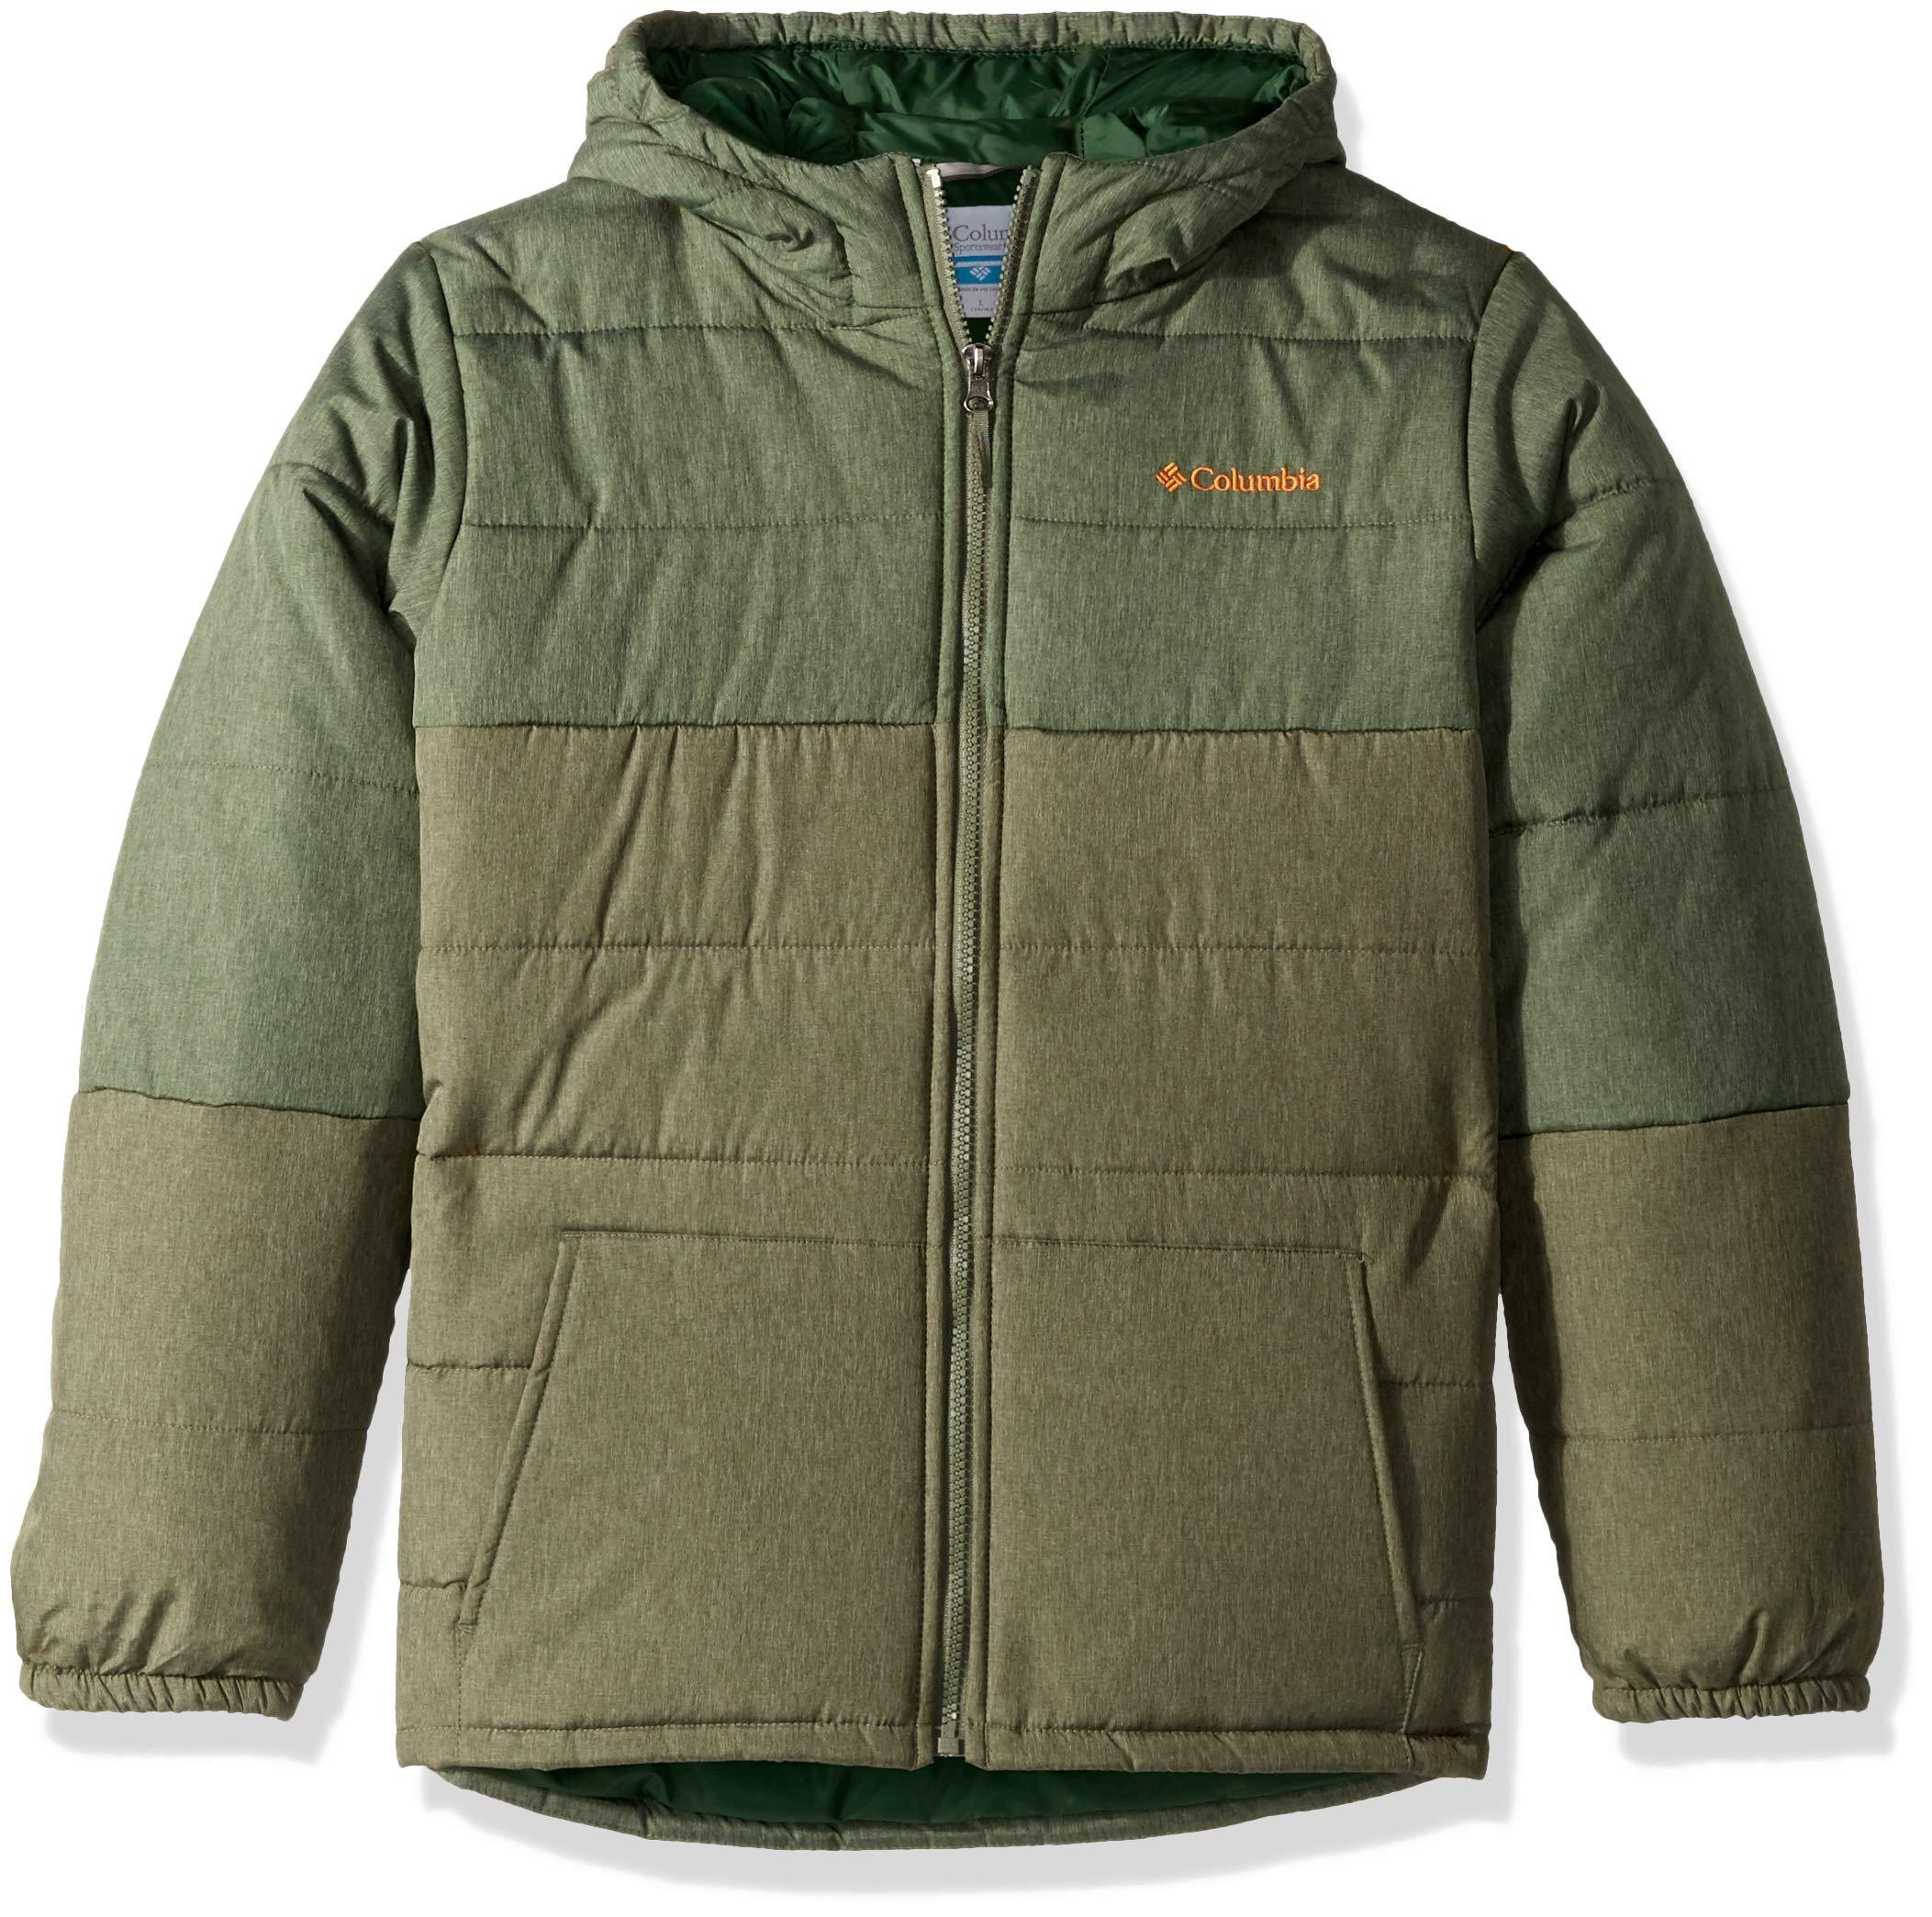 Columbia Kids Boy's Puffect¿ Jacket (Little Kids/Big Kids) Forest Heather/Cypress Heather/Solar Medium